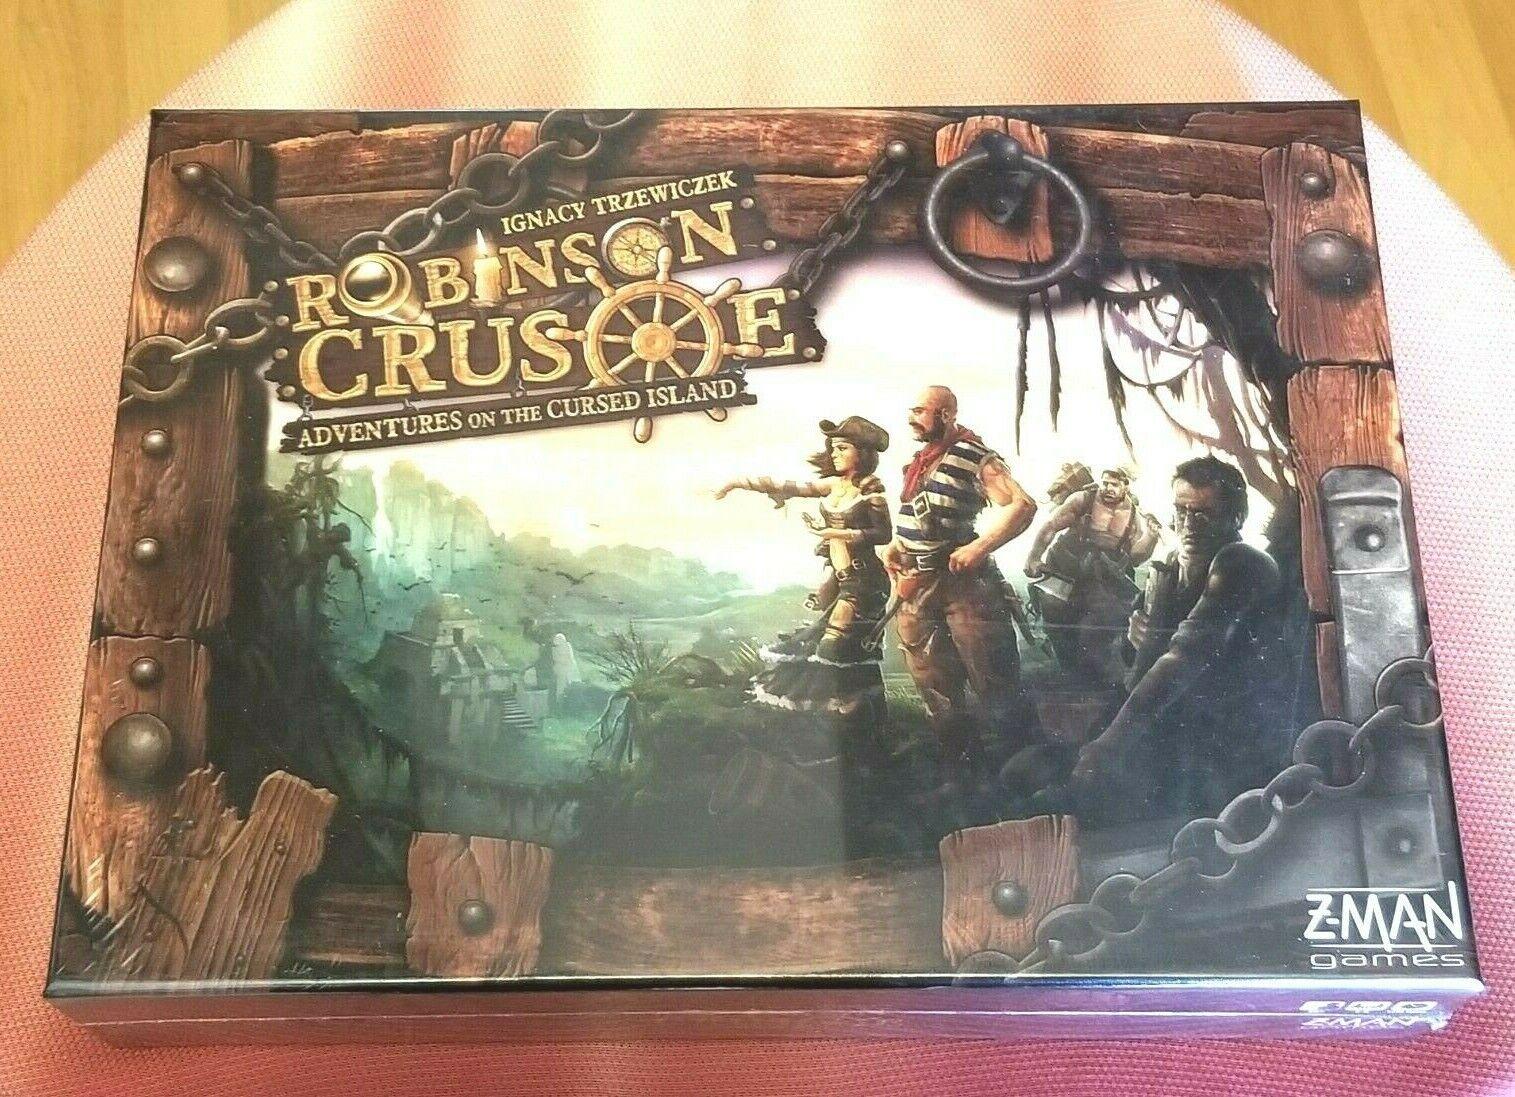 NOUVEAU  ROBINSON CRUSOE aventures de la maudite île Board Game 1st éd. - Comme neuf  bénéfice nul